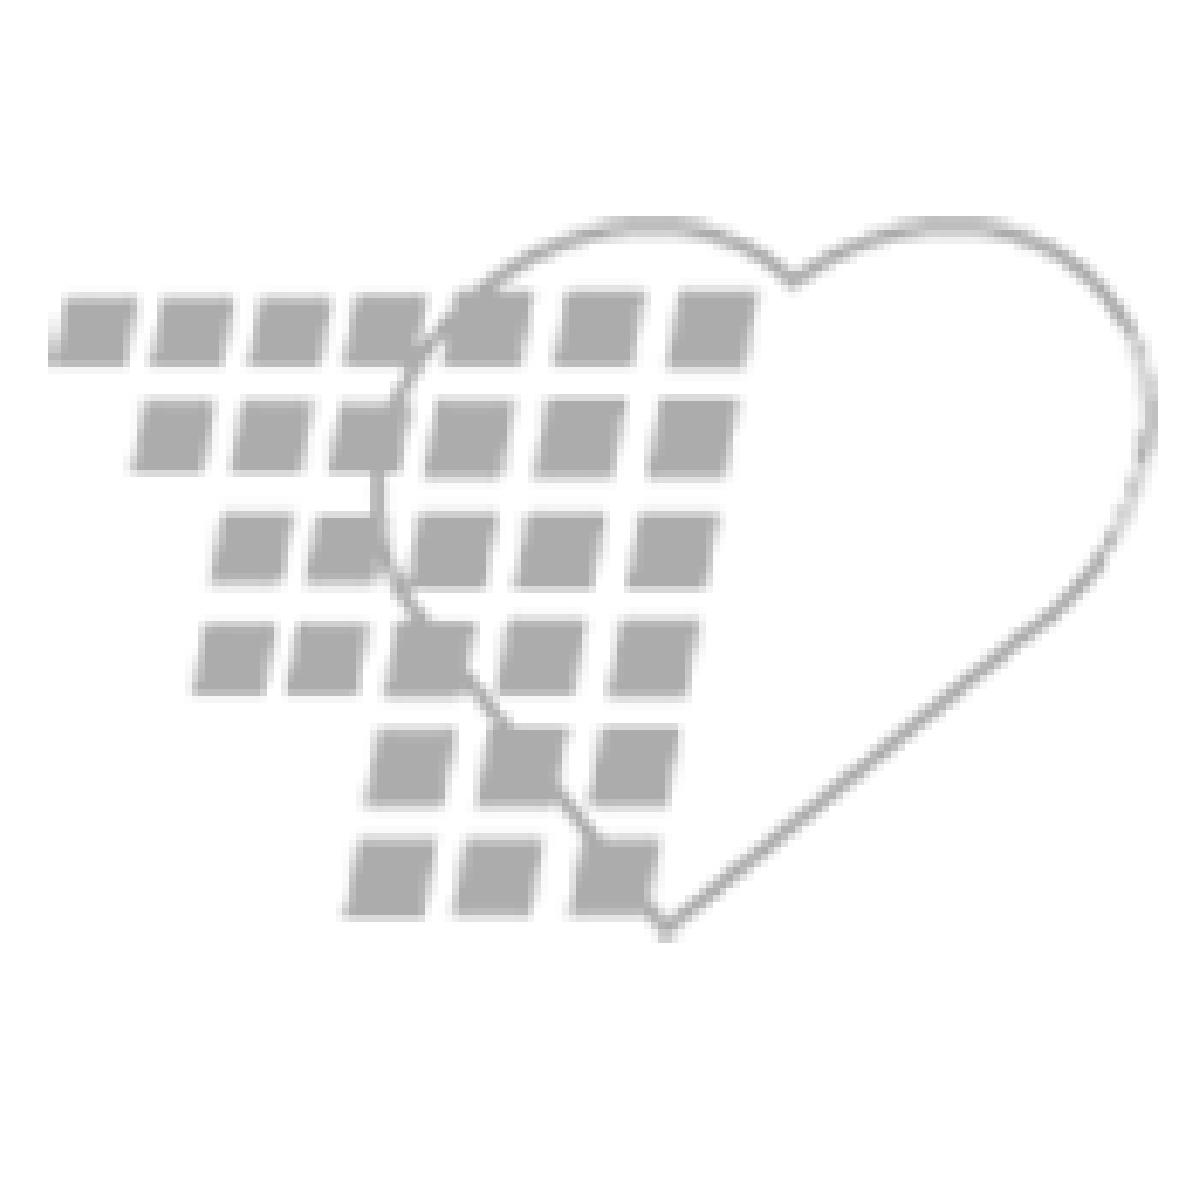 12-81-2140 Simulaids Sani Child CPR Manikin